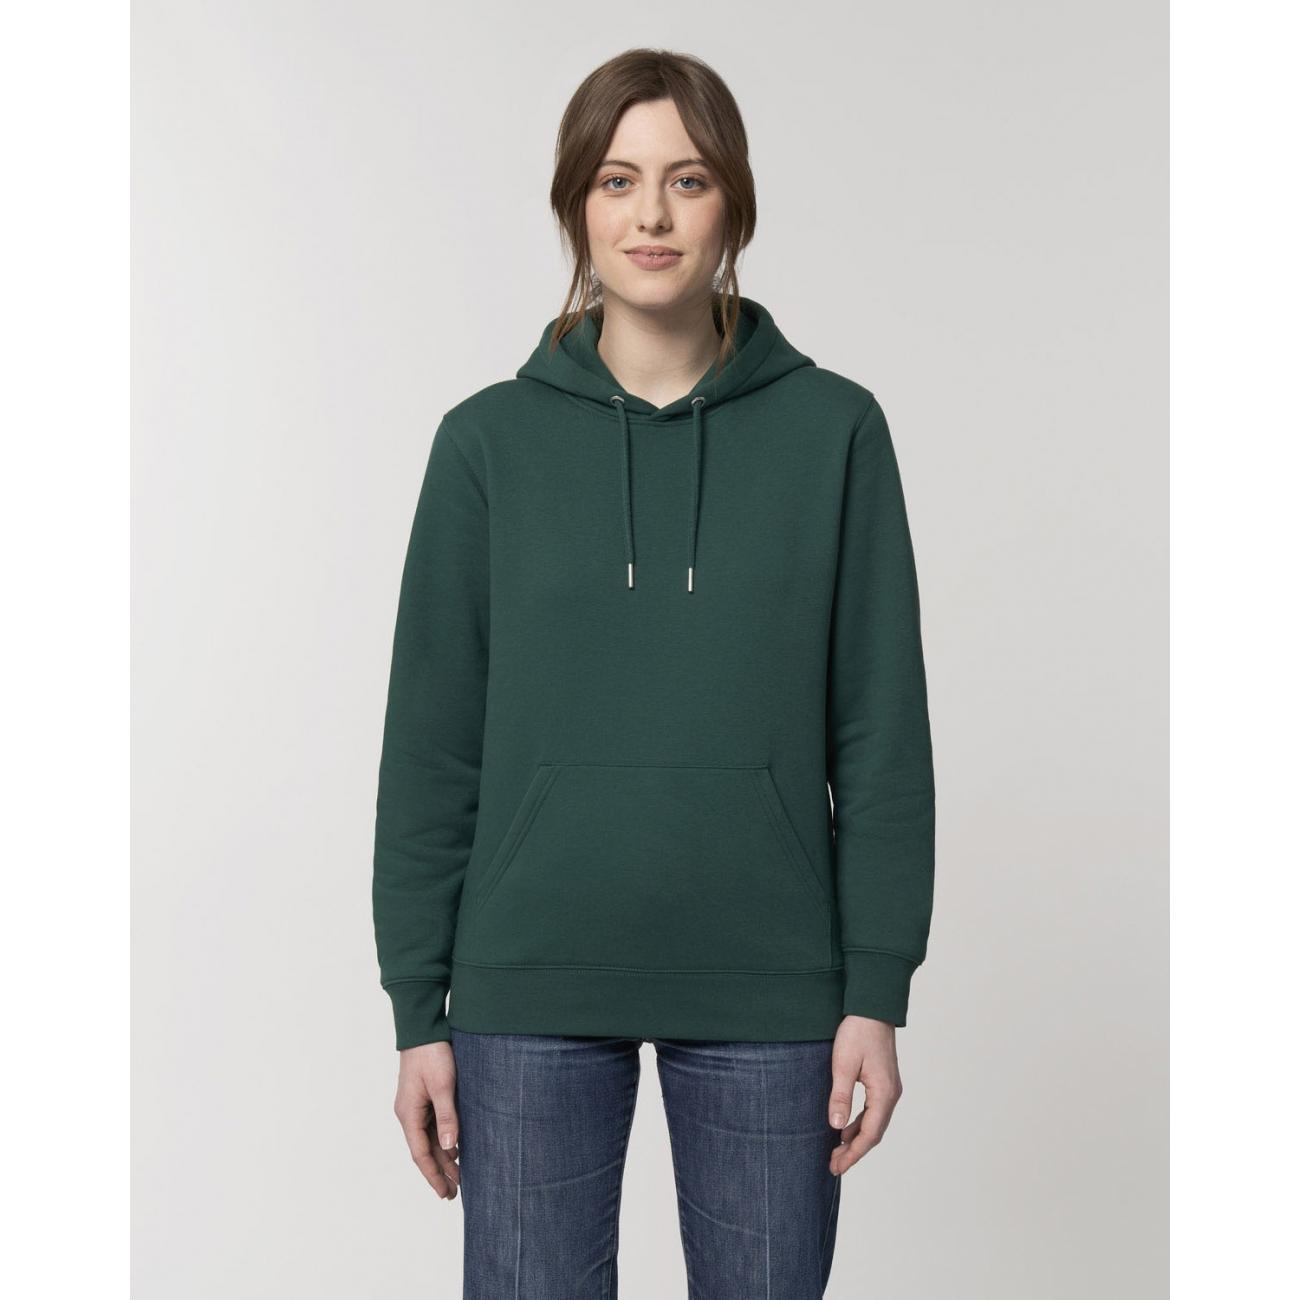 https://tee-shirt-bio.com/9140-thickbox_default/sweat-shirt-femme-capuche-epais-et-interieur-doux-coton-bio-vert-bouteille.jpg